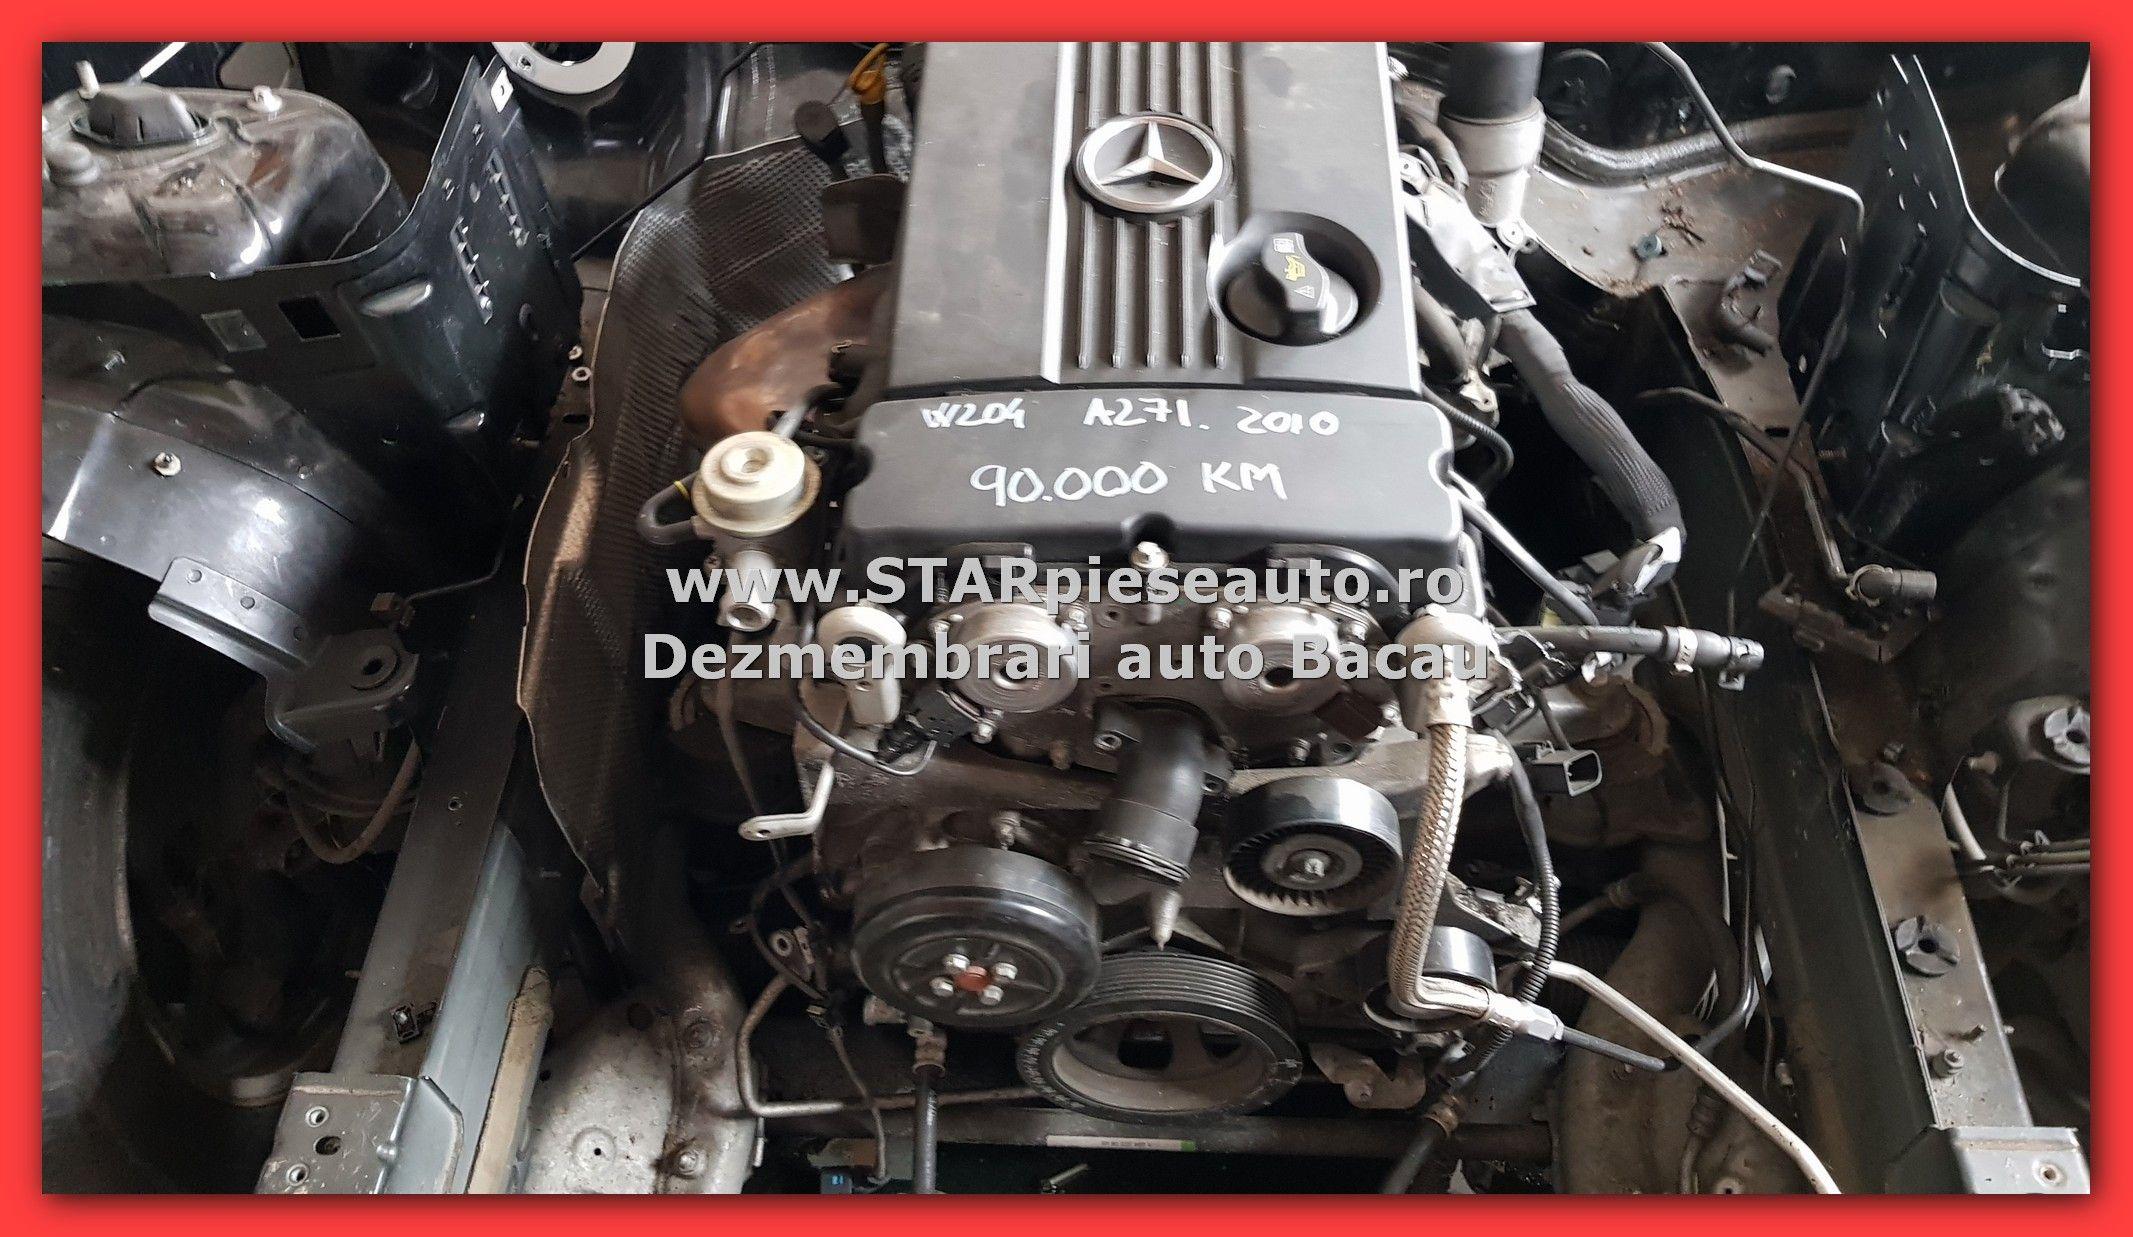 Motor Mercedes C180 Kompressor W204 Tip Motor A 271 952 Cu 90 000 De Km Starpieseauto Dezmembrari Bacau Va Ofera Piese Auto Originale Din Dez Auto Motor Romani